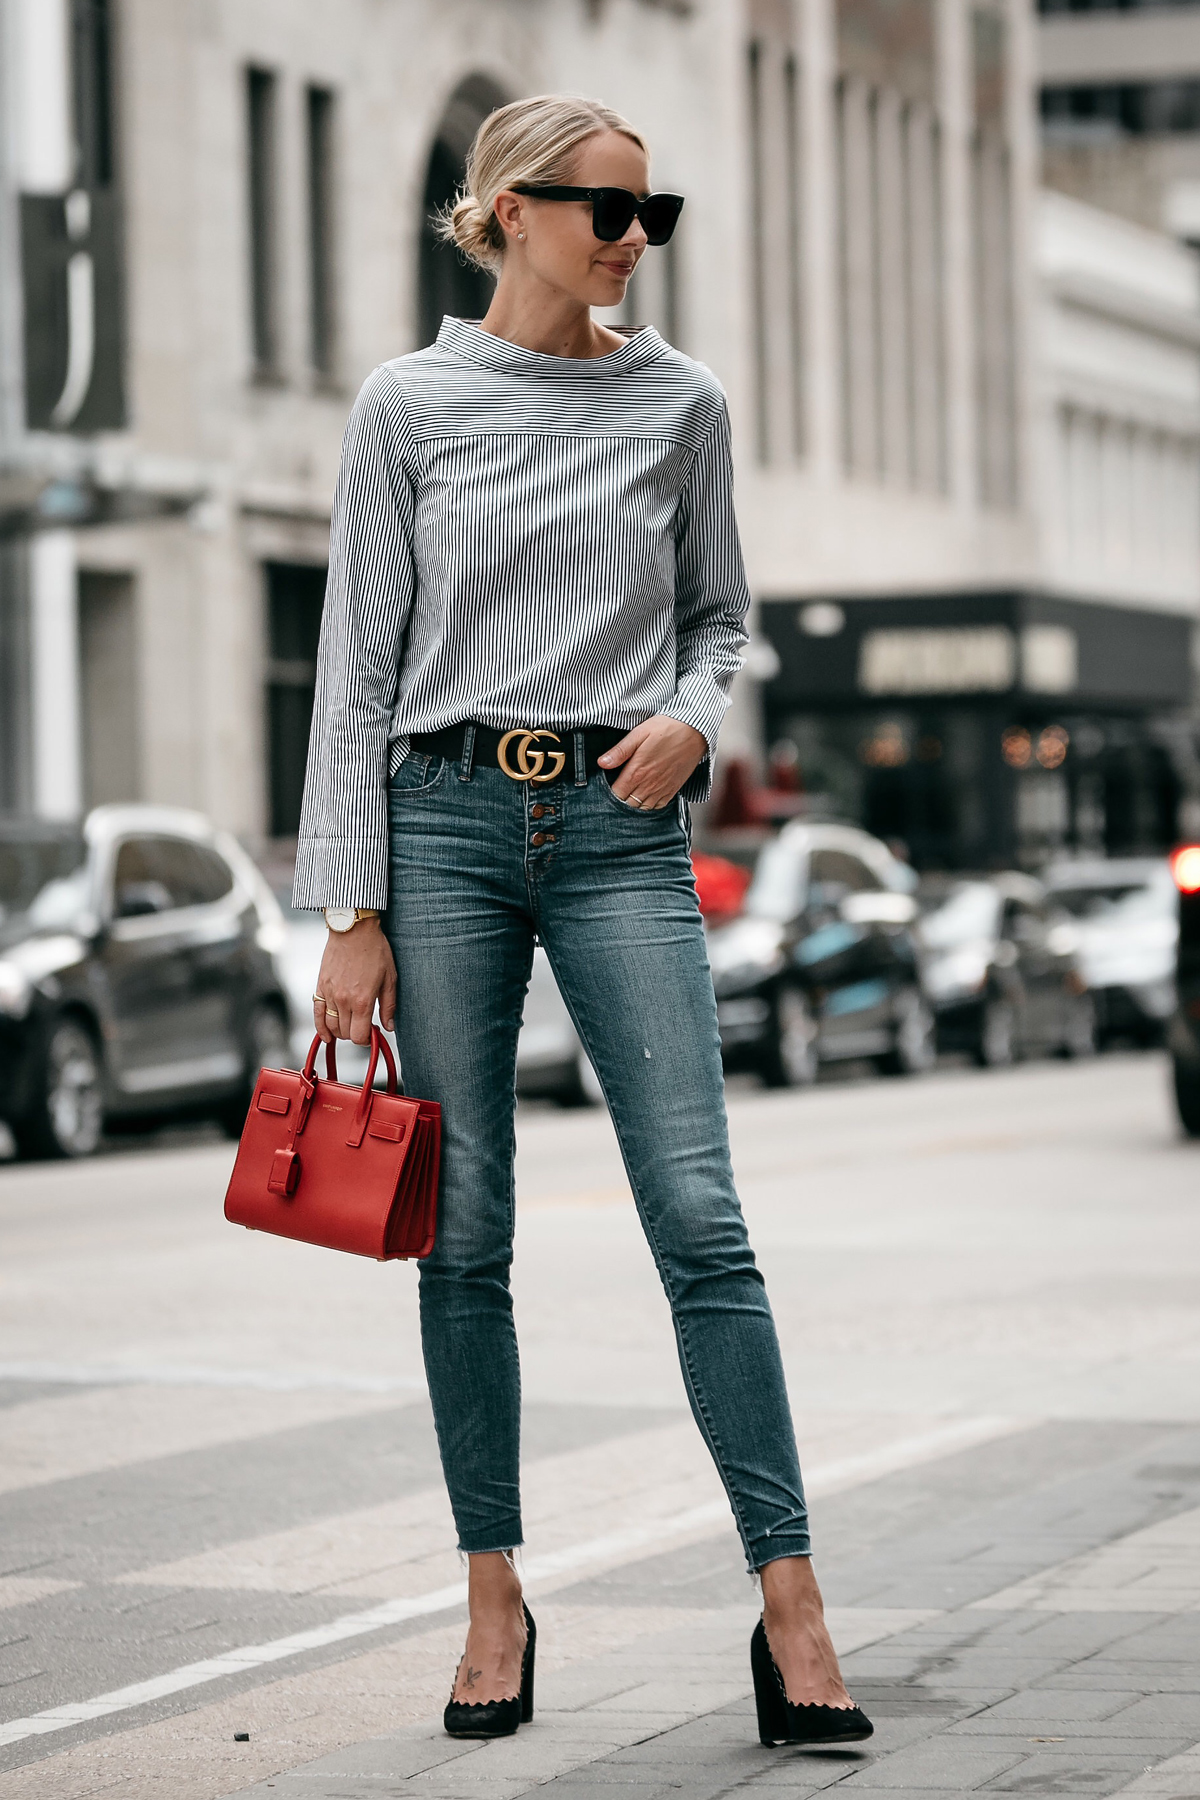 Blonde Woman Wearing Jcrew Grey Striped Shirt Denim Skinny Jeans Gucci Belt Saint Laurent Sac De Jour Mini Red Chloe Scalloped Pumps Fashion Jackson Dallas Blogger Fashion Blogger Street Style